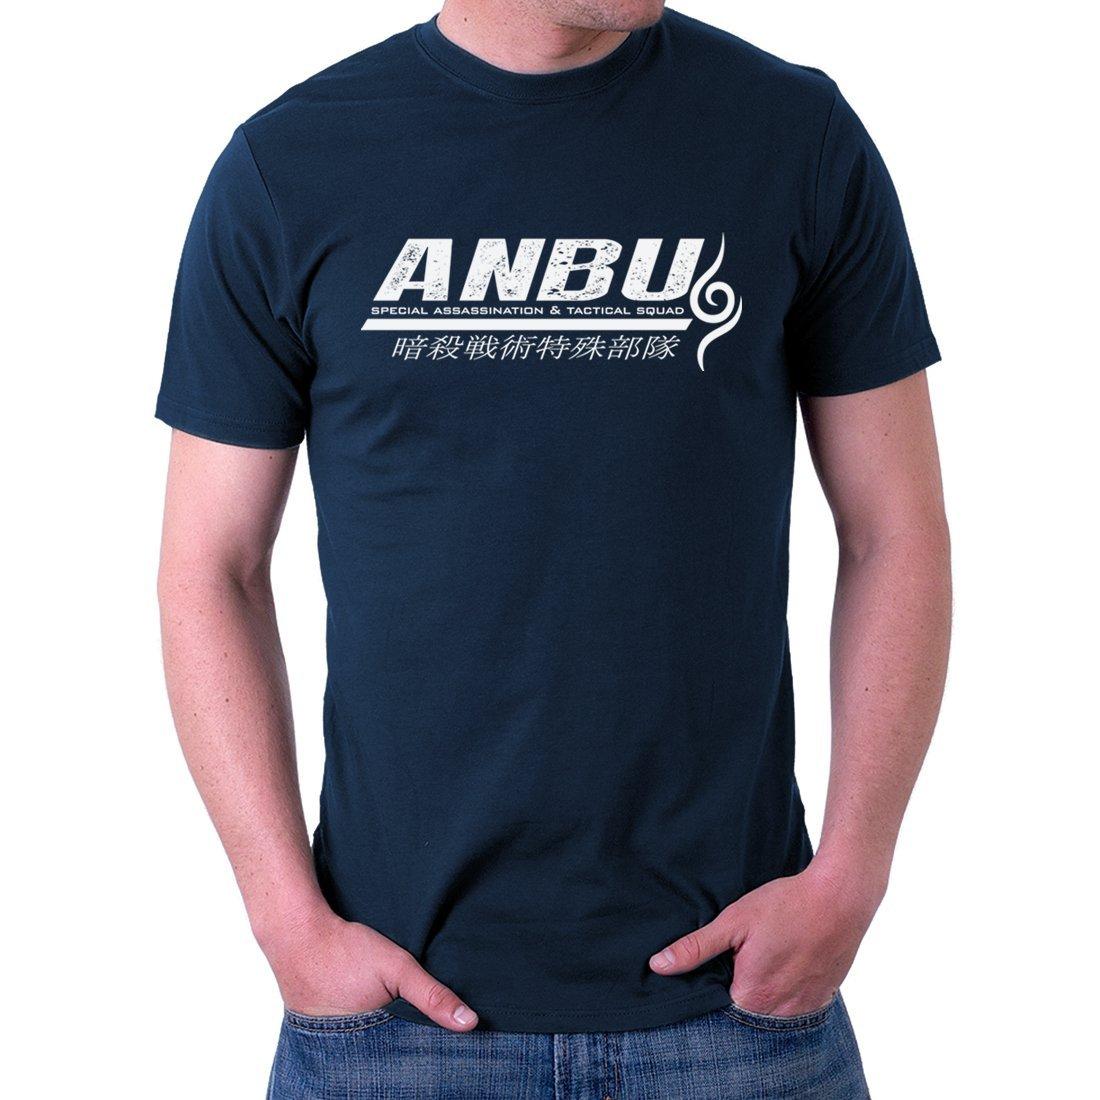 ANBU Ninja Team Shinobi Squad - Adult T-Shirt for Naruto Anime